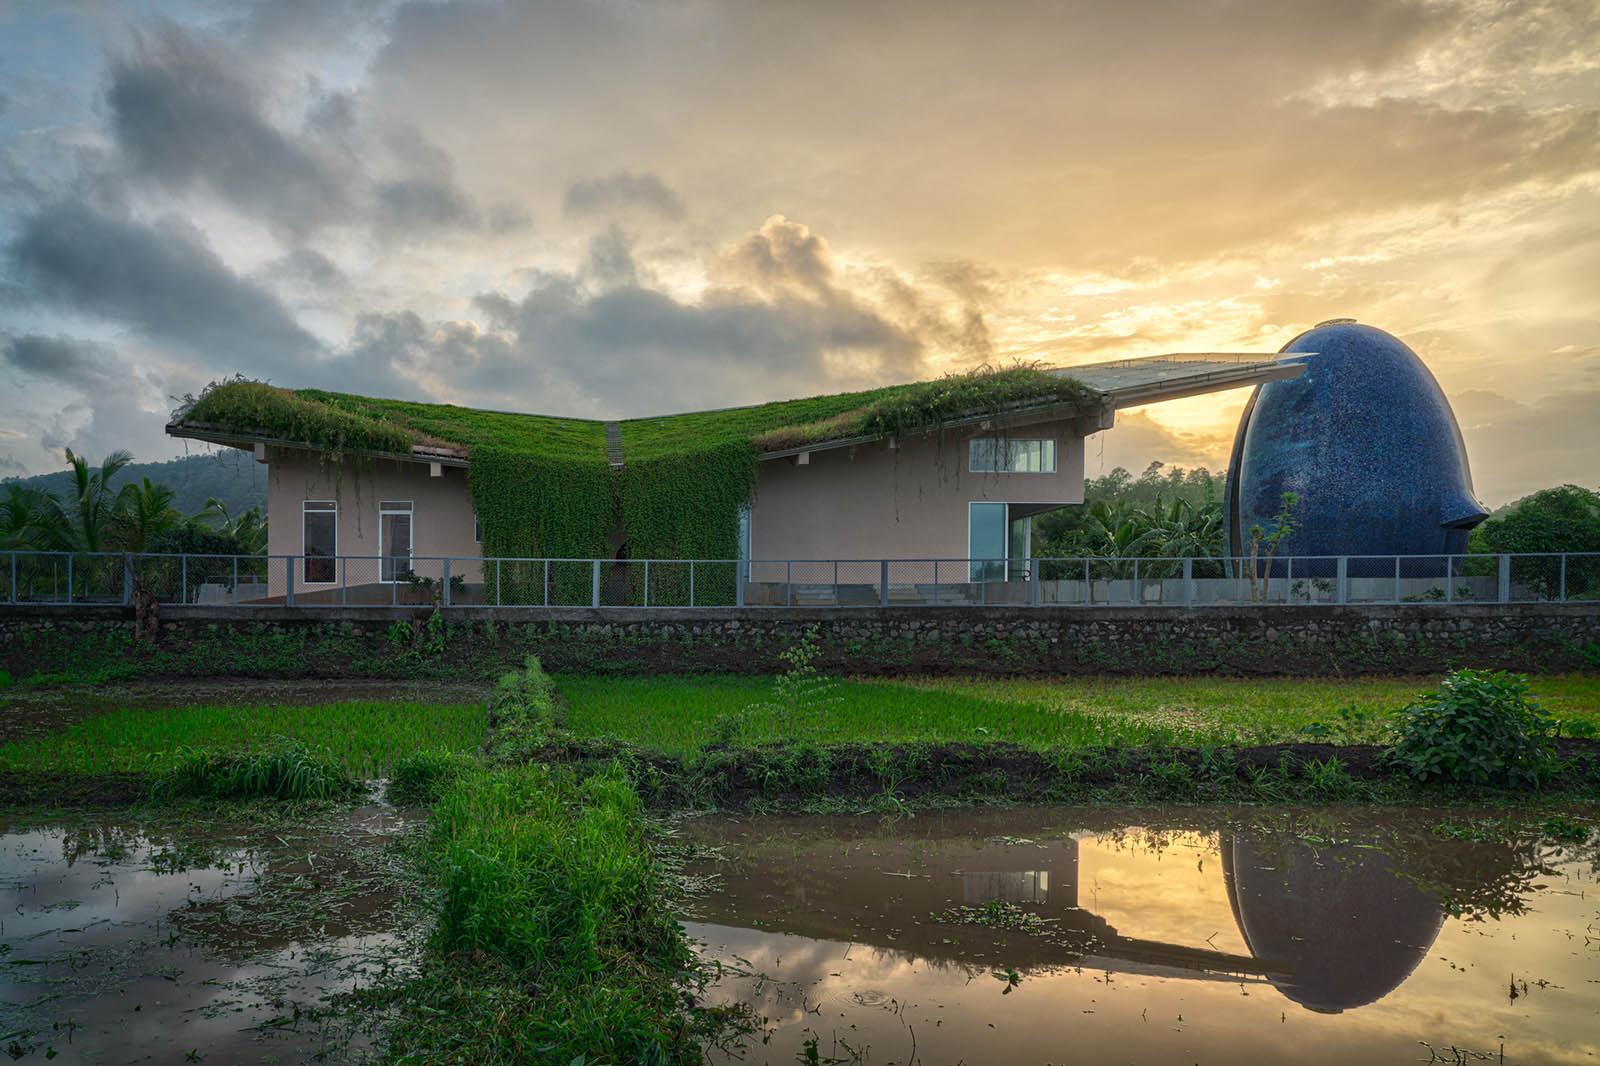 sunoo-temple-house:-un-tetto-verde-sul-mondo